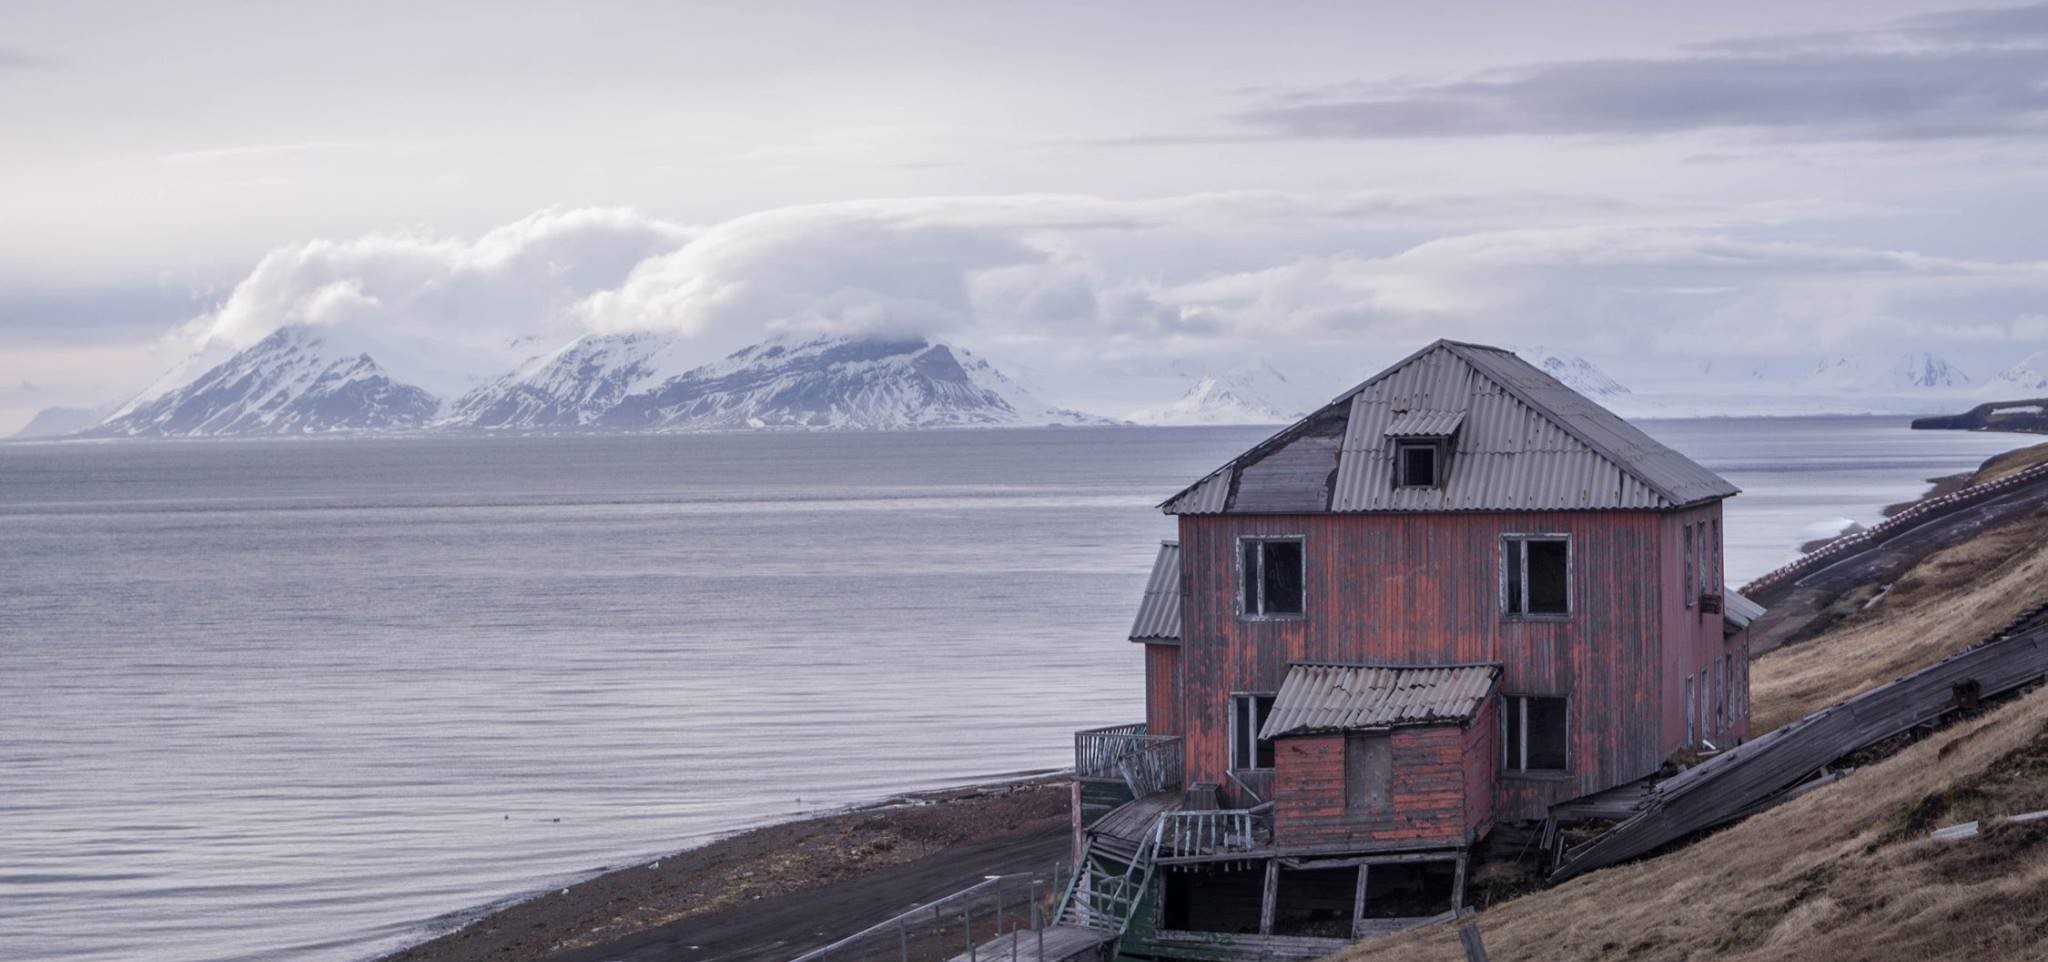 Bắc Cực